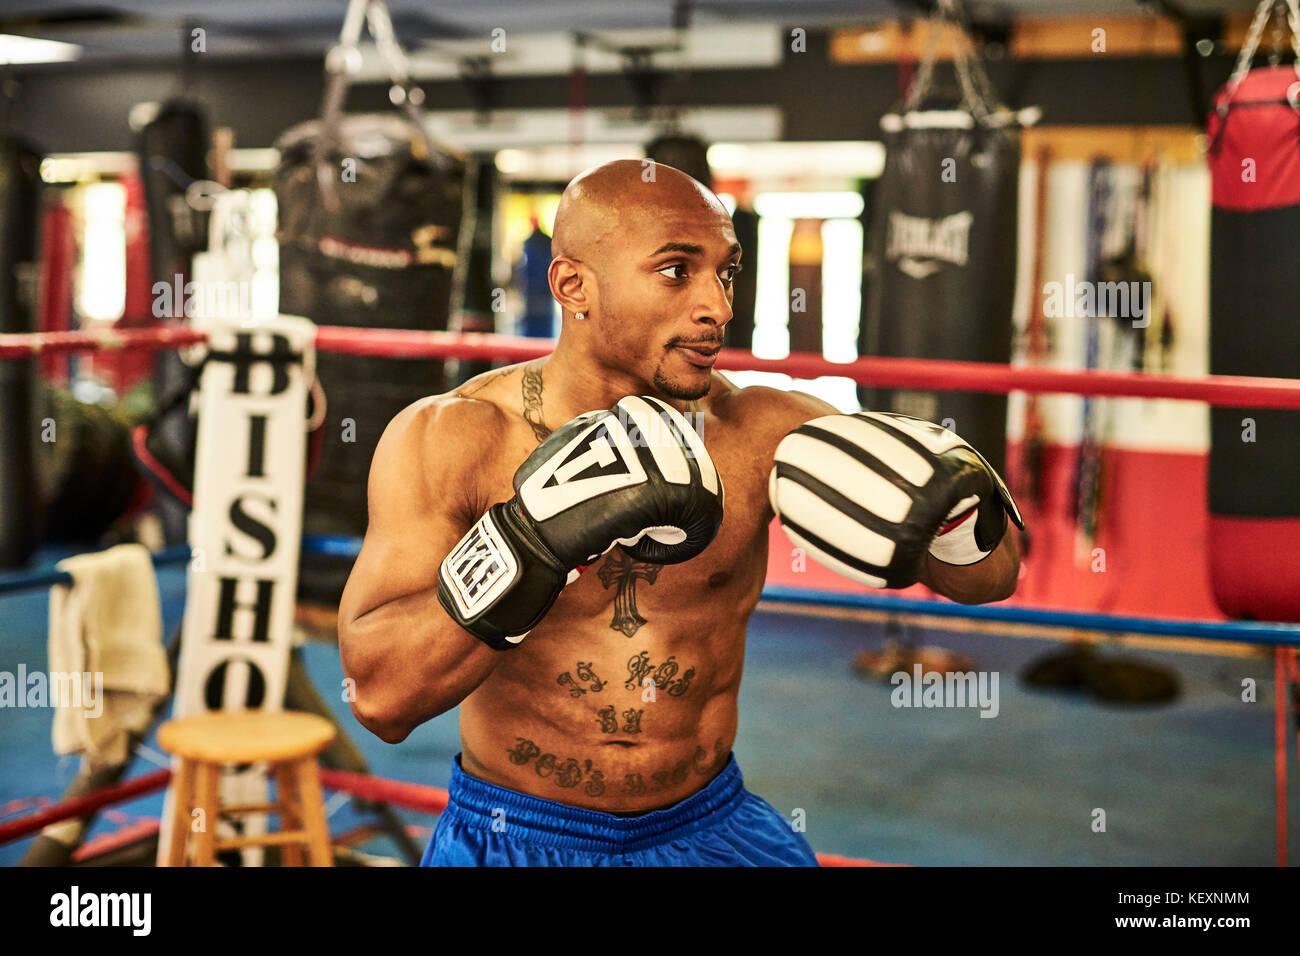 Side view of male boxer training inside boxing ring, Taunton, Massachusetts, USA - Stock Image